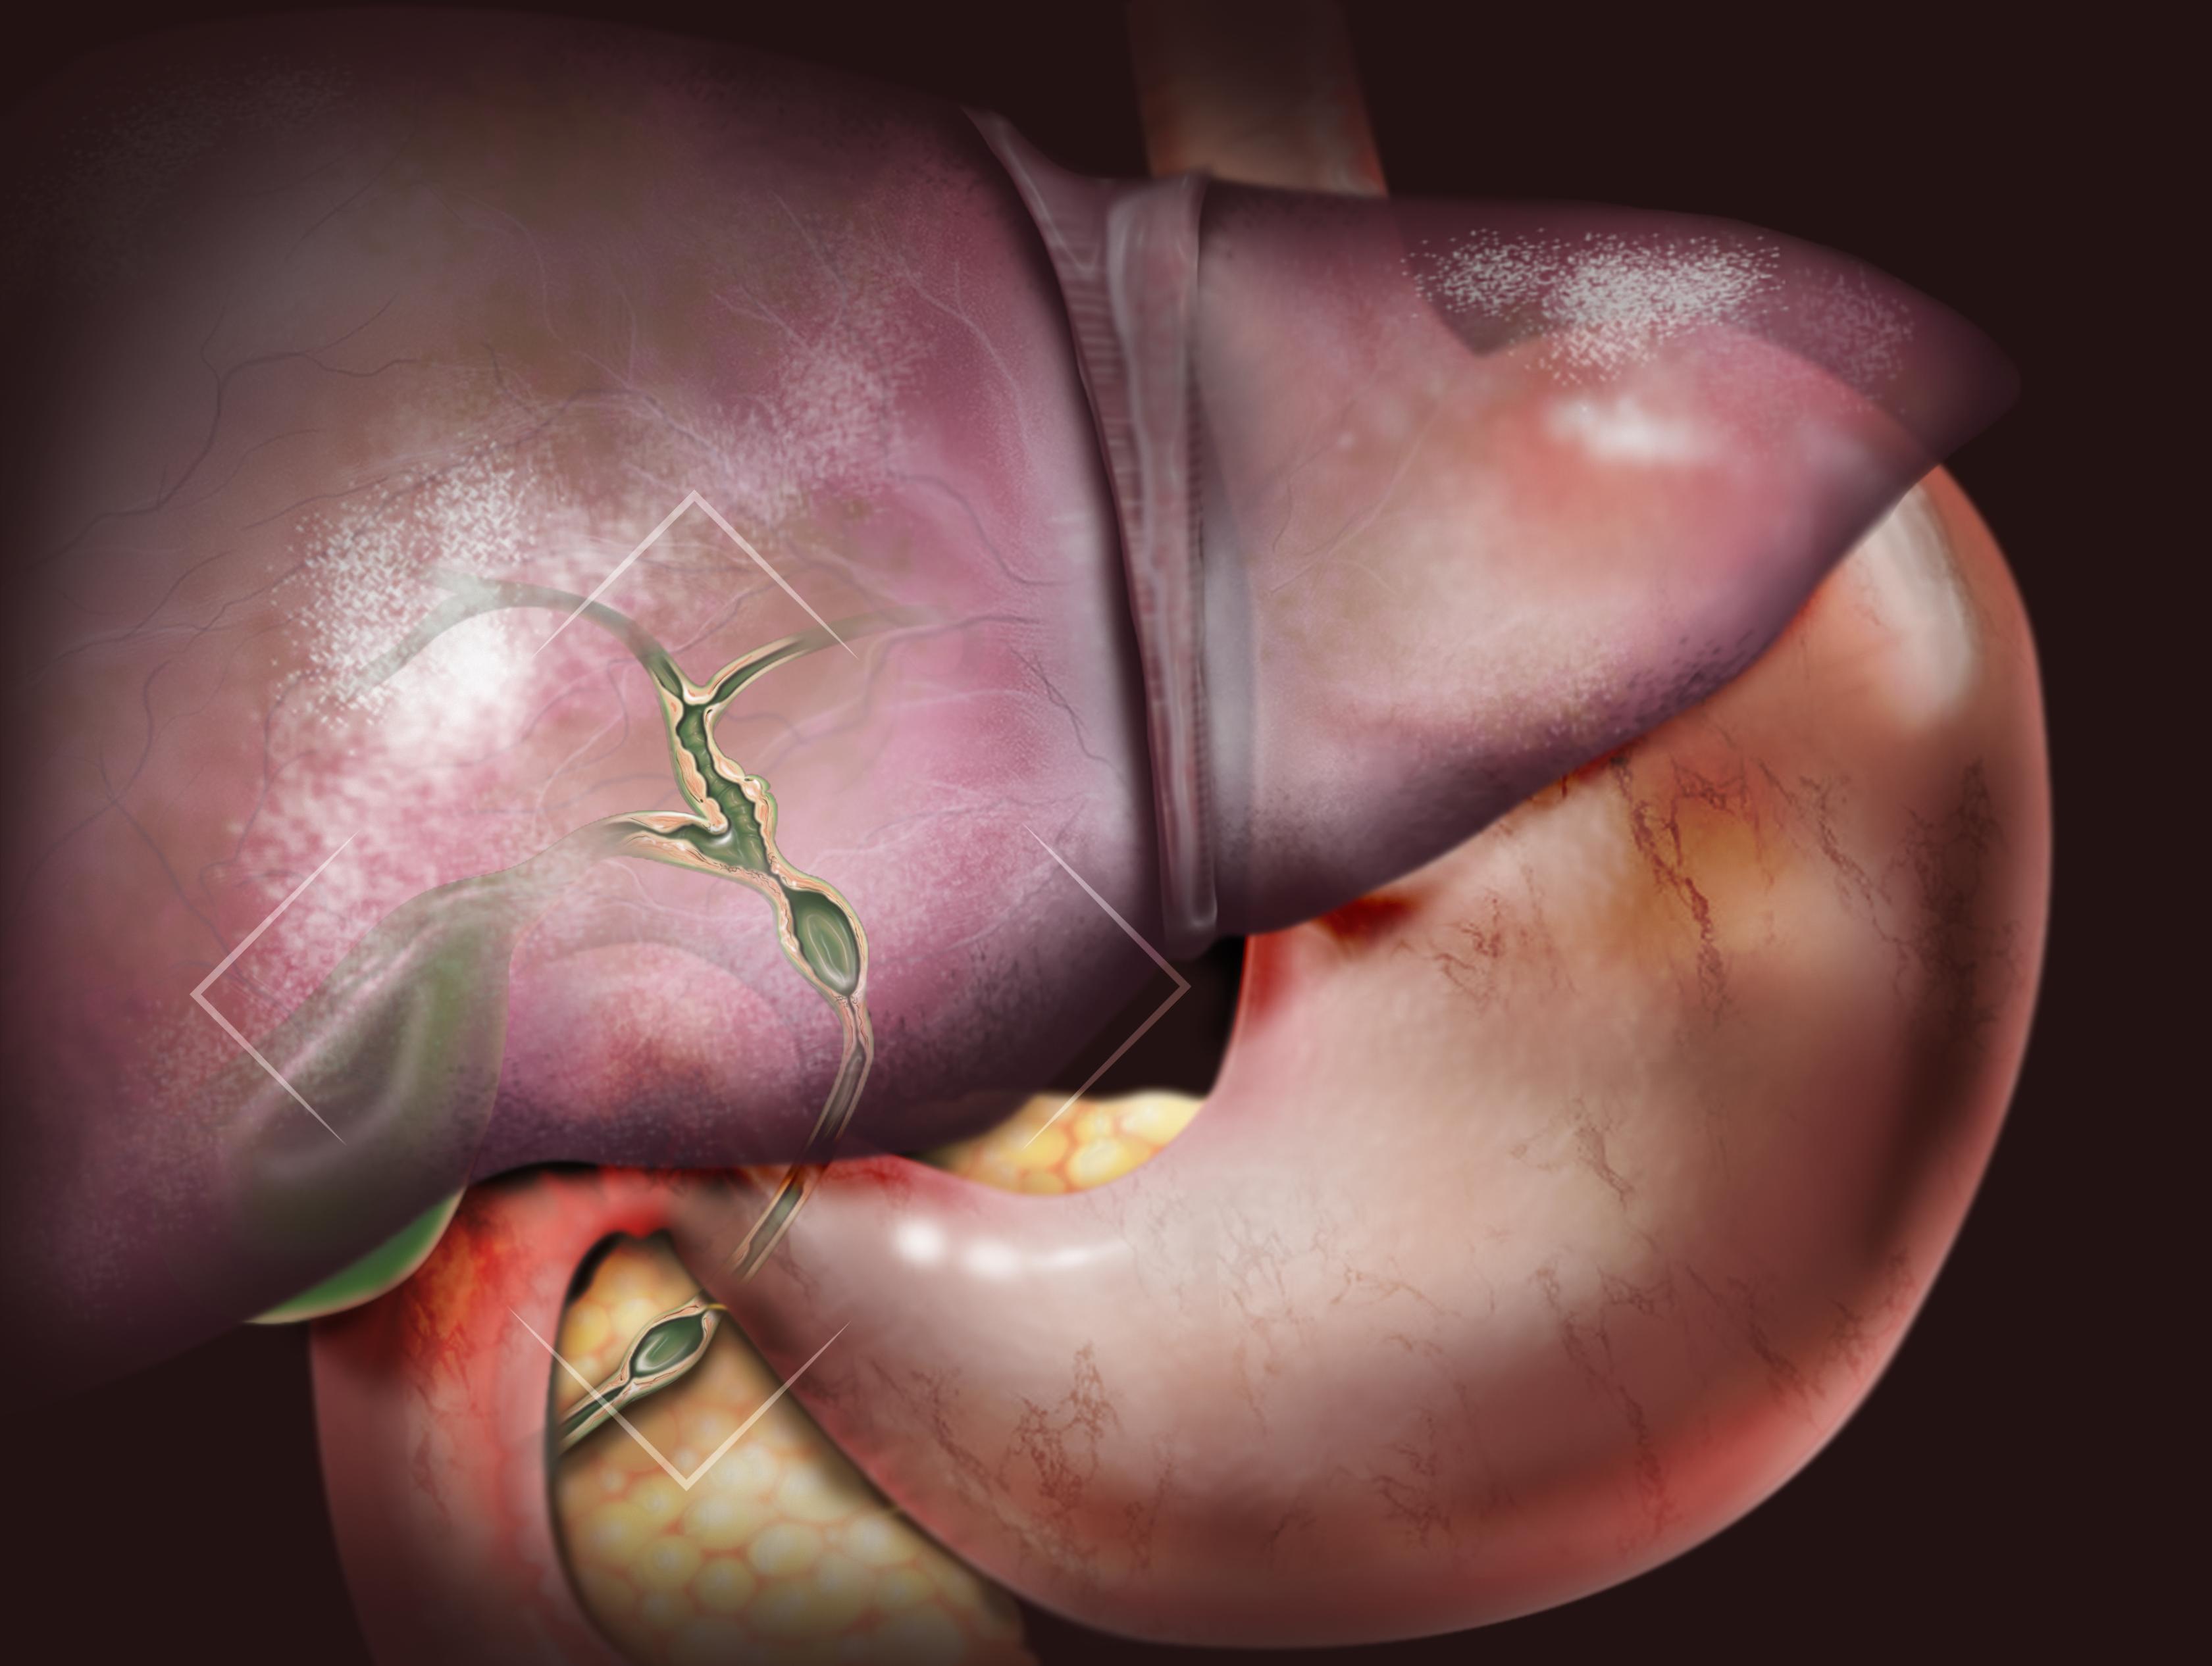 hepato disease